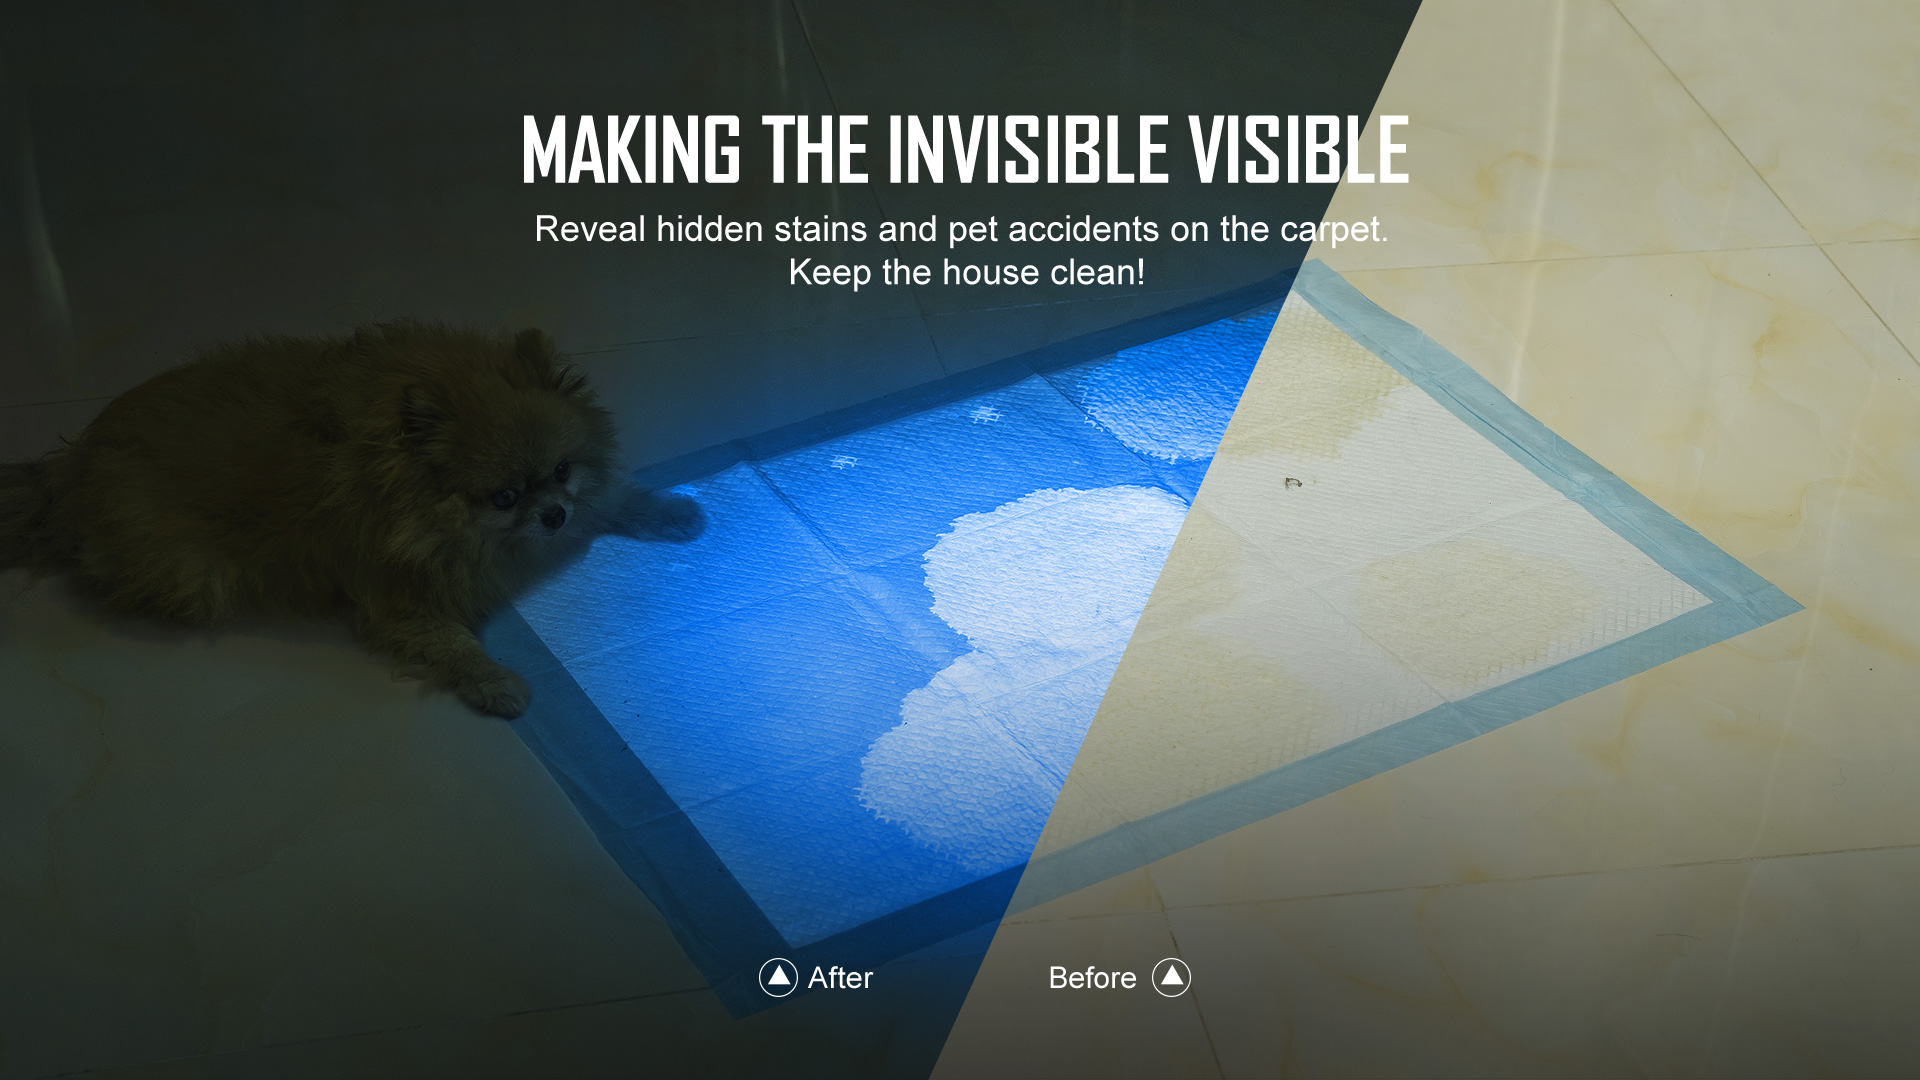 Olight i5 UV EOS Ultraviolet Flashlight Invisible to Visible